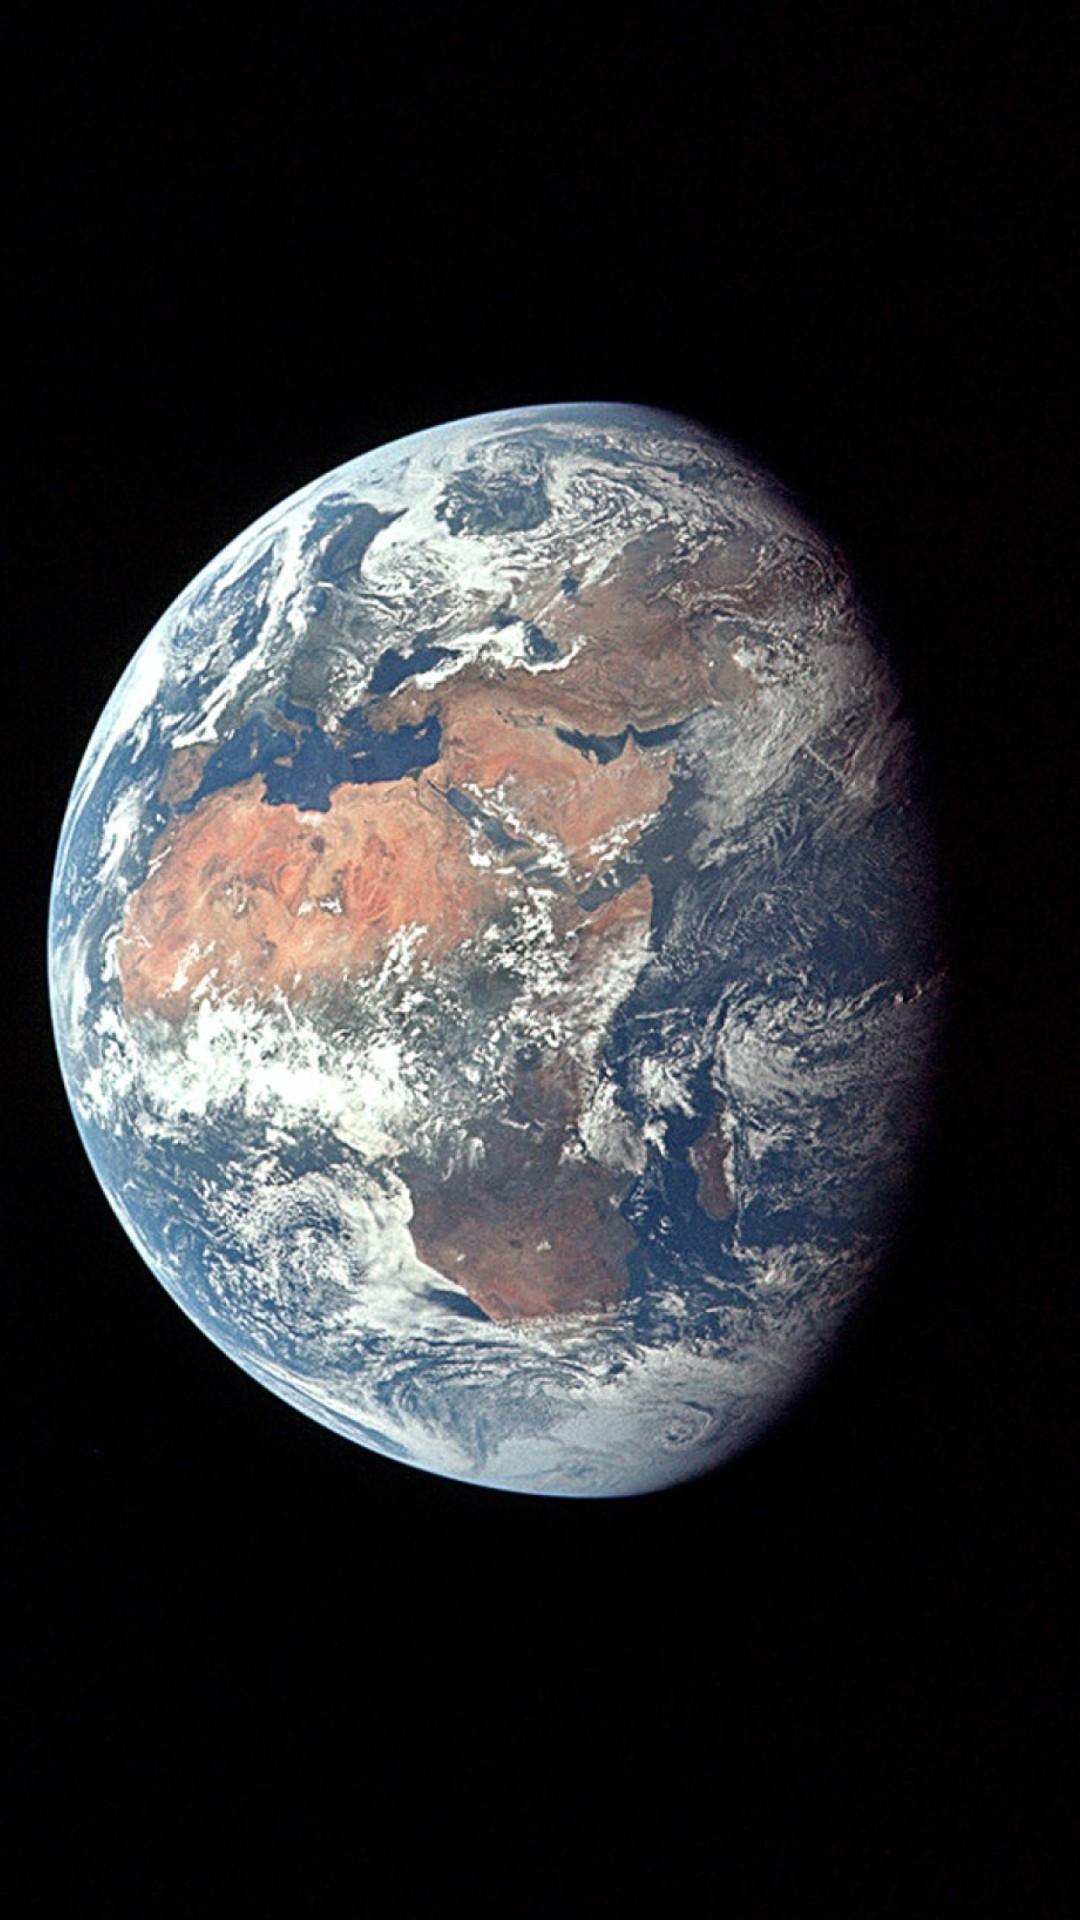 Planet iPhone 7 wallpaper